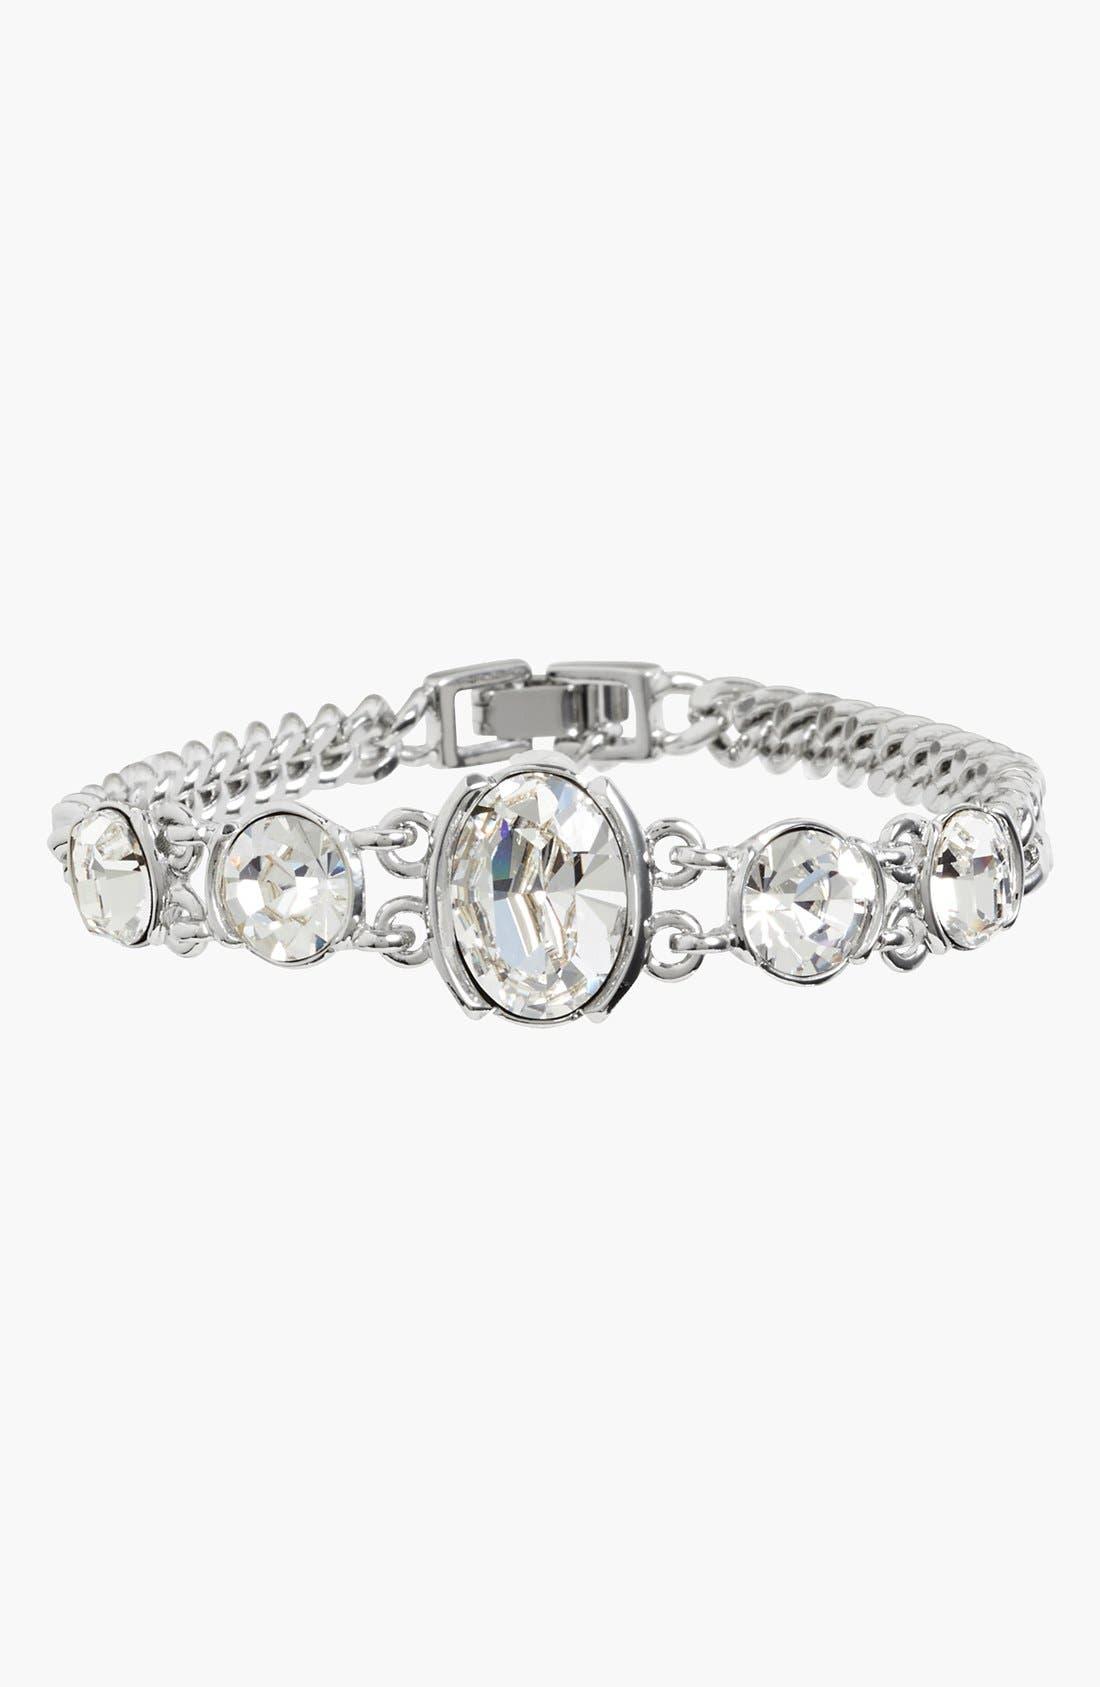 Main Image - Givenchy Crystal Curb Link Bracelet